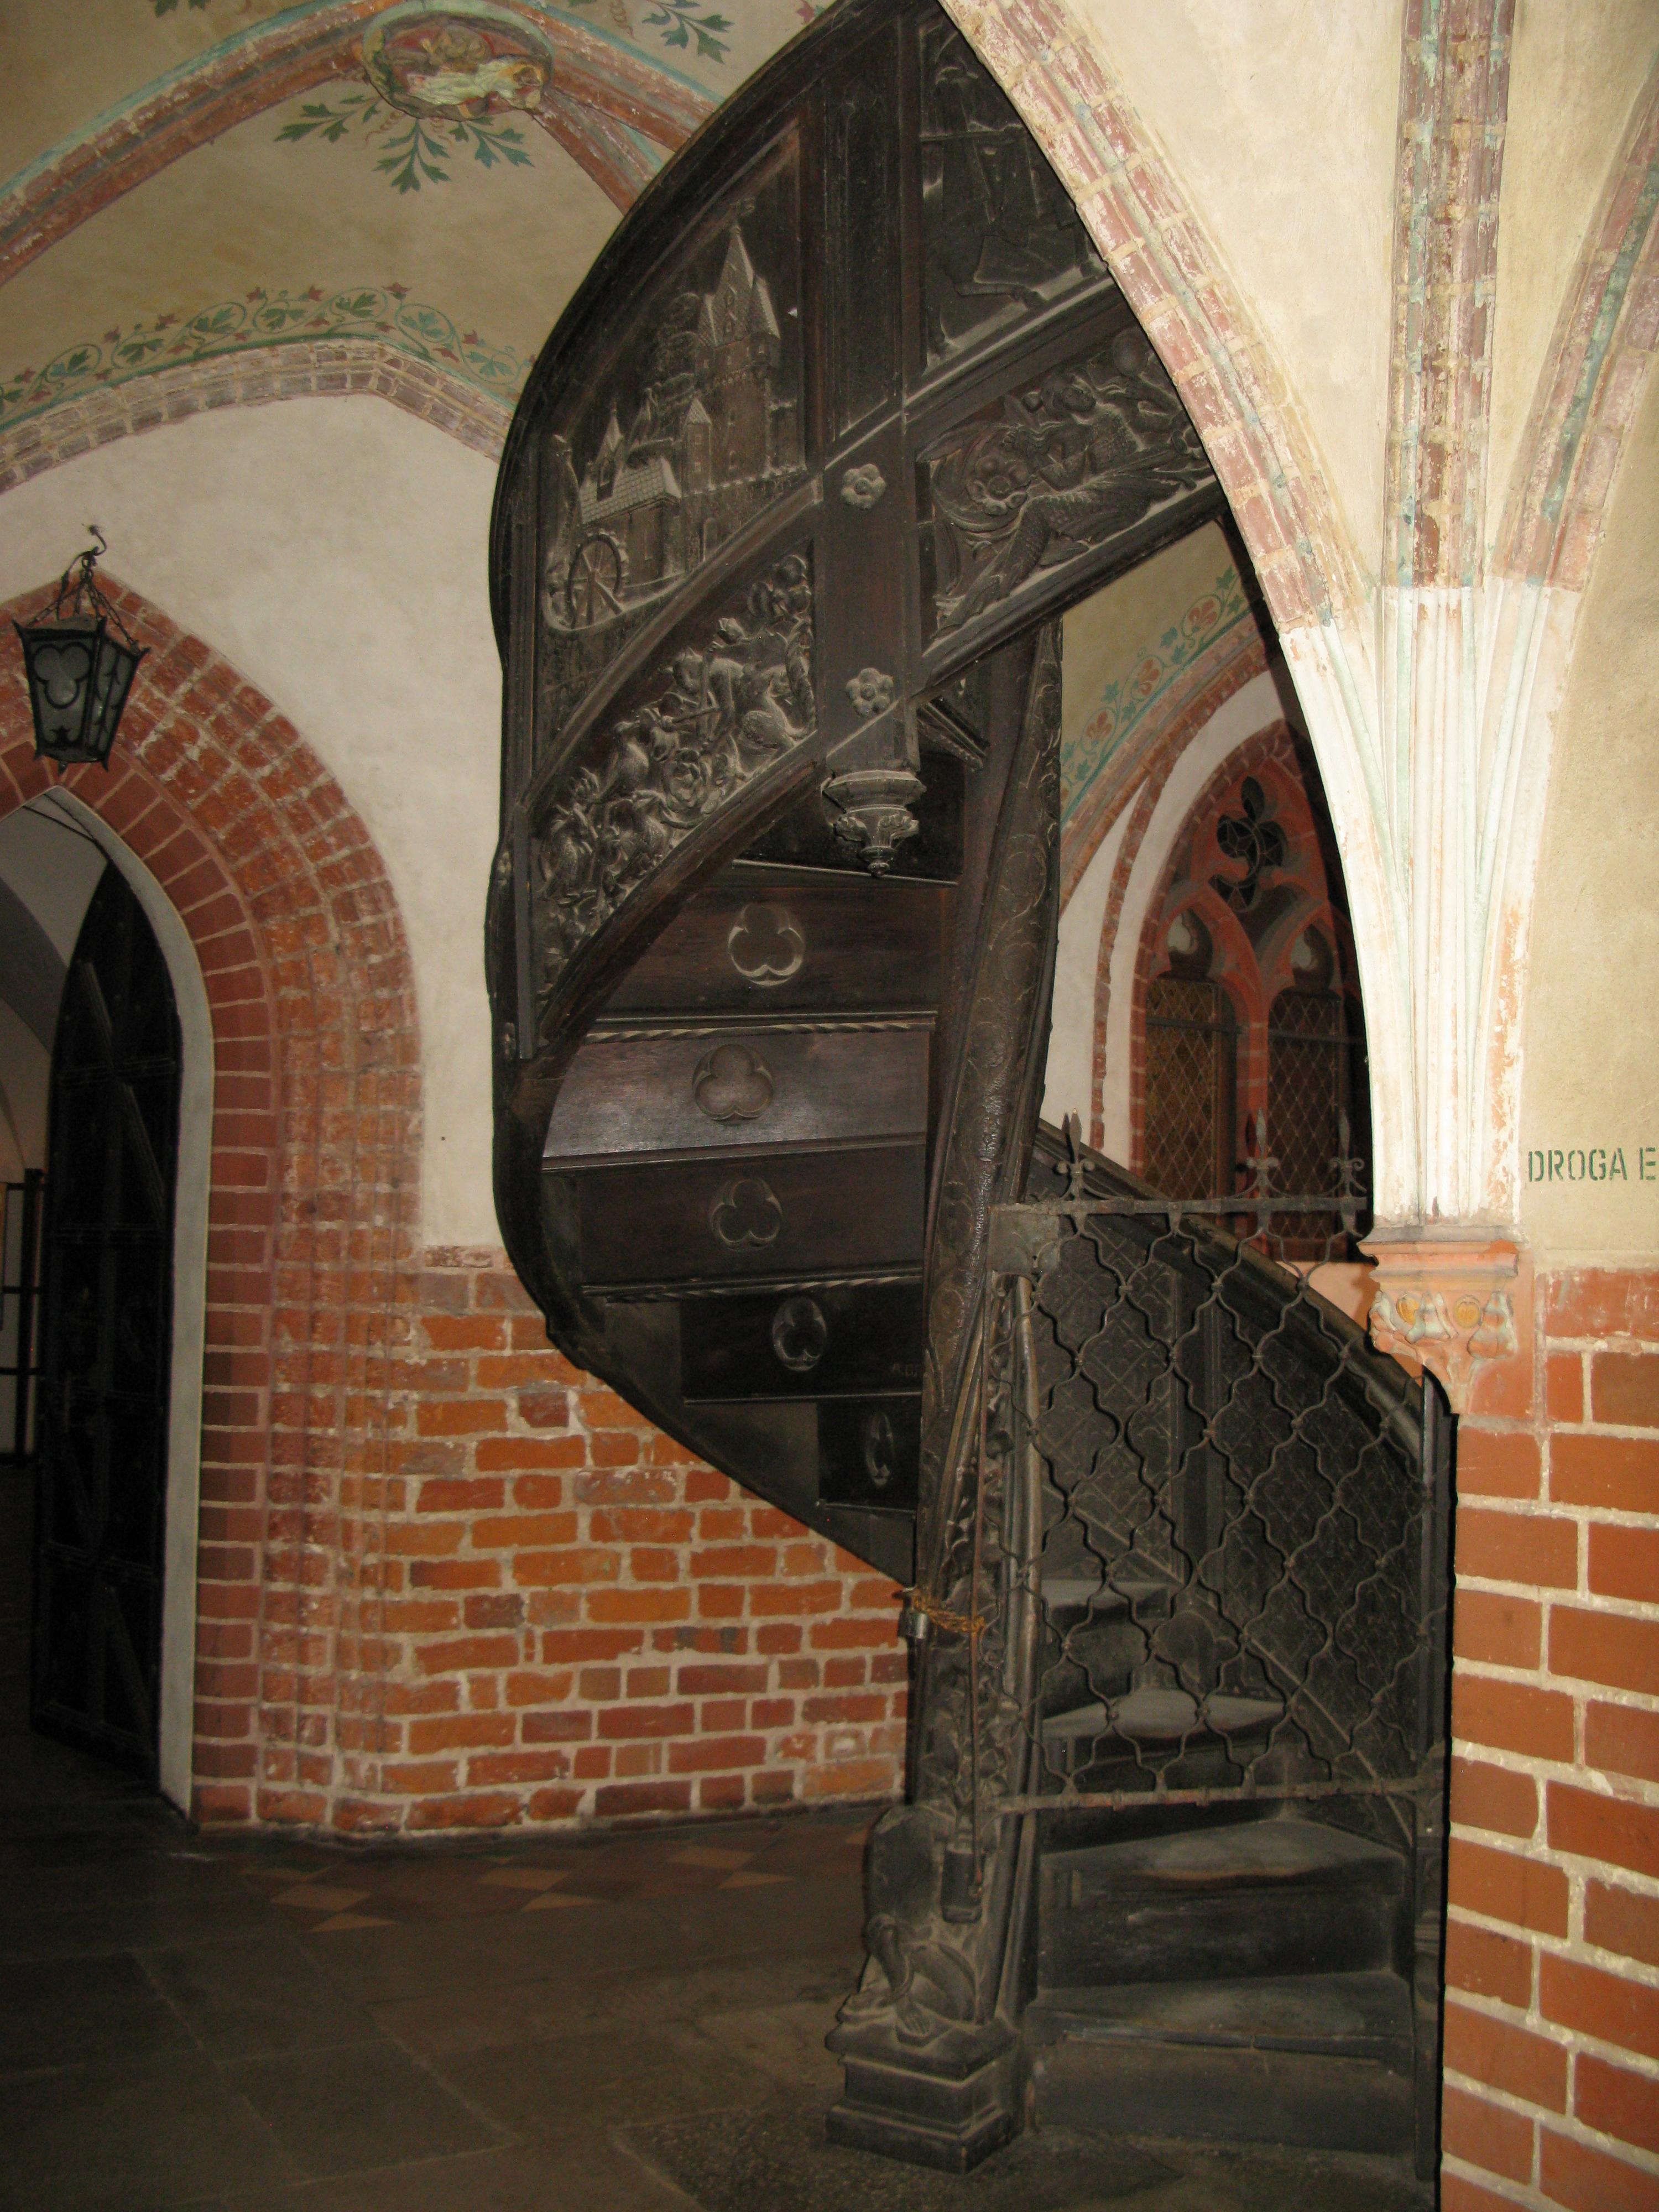 File:Malbork Castle Spiral Staircase.jpg - Wikimedia Commons